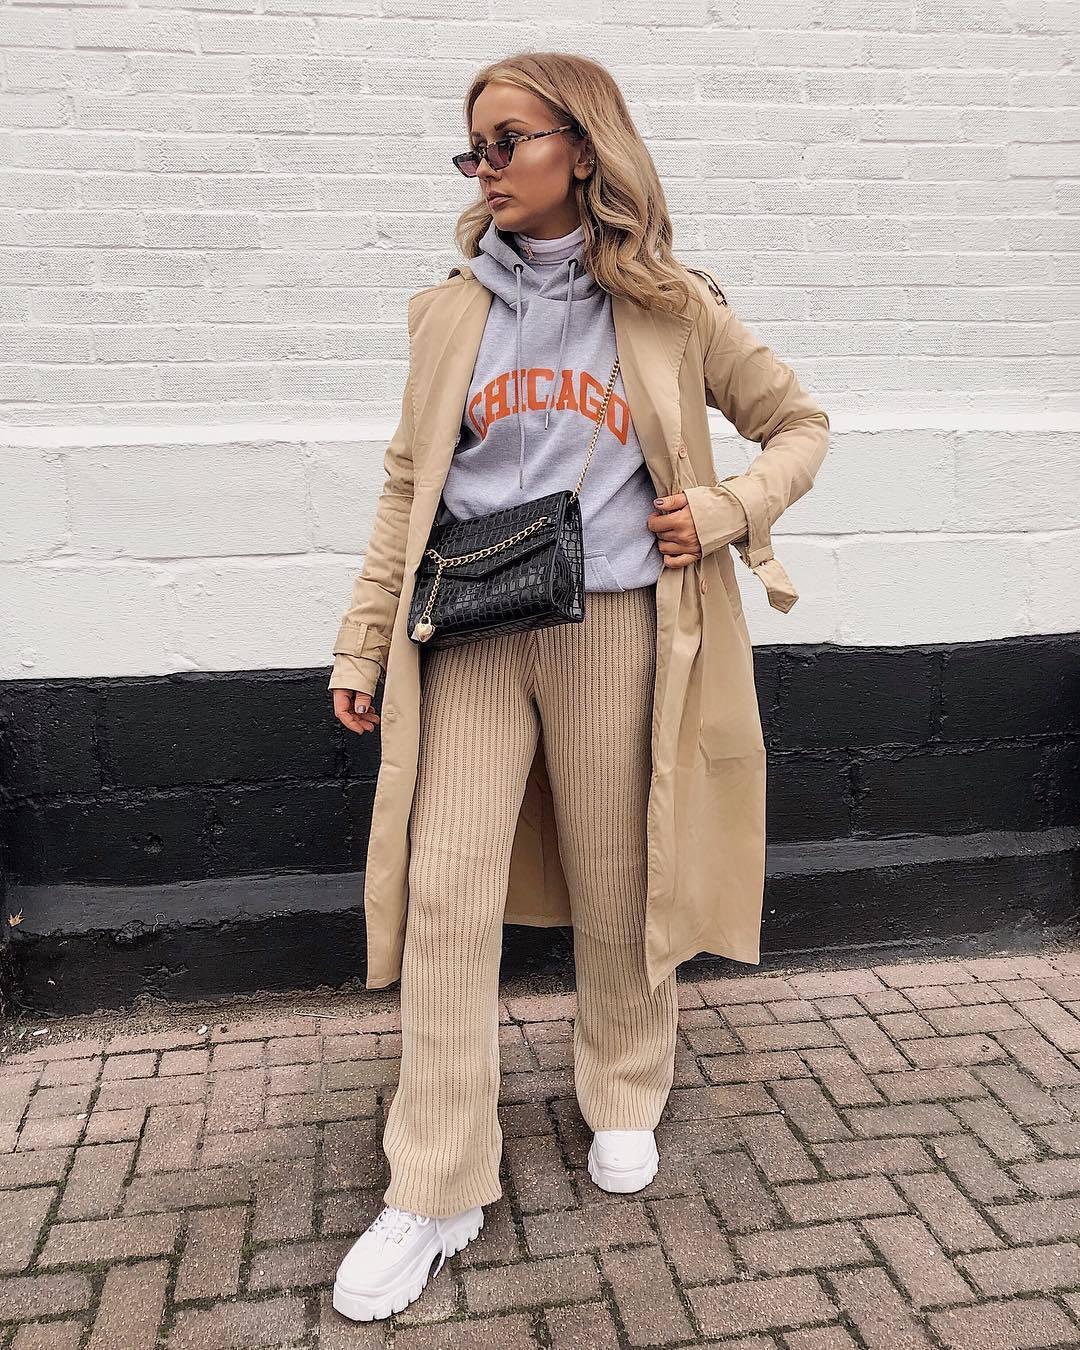 pants flare pants knit white shoes platform shoes beige coat trench coat grey hoodie black bag white turtleneck top